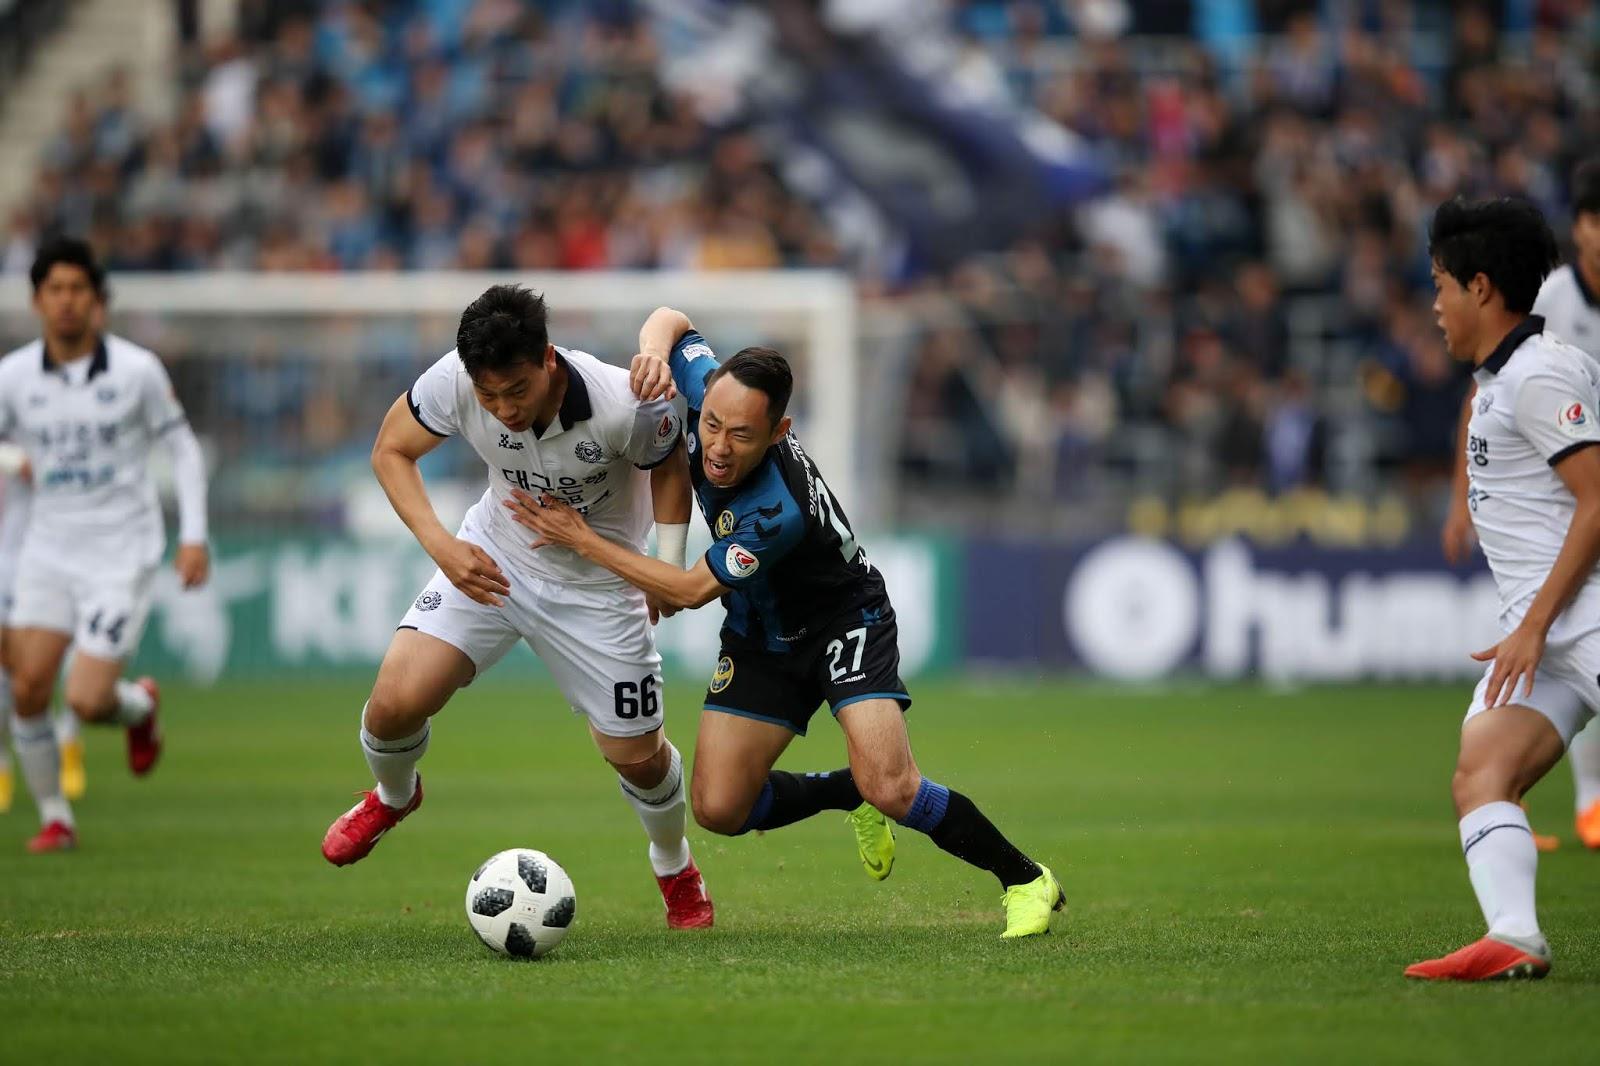 Interview: Daegu FC Defender Park Byung-hyun